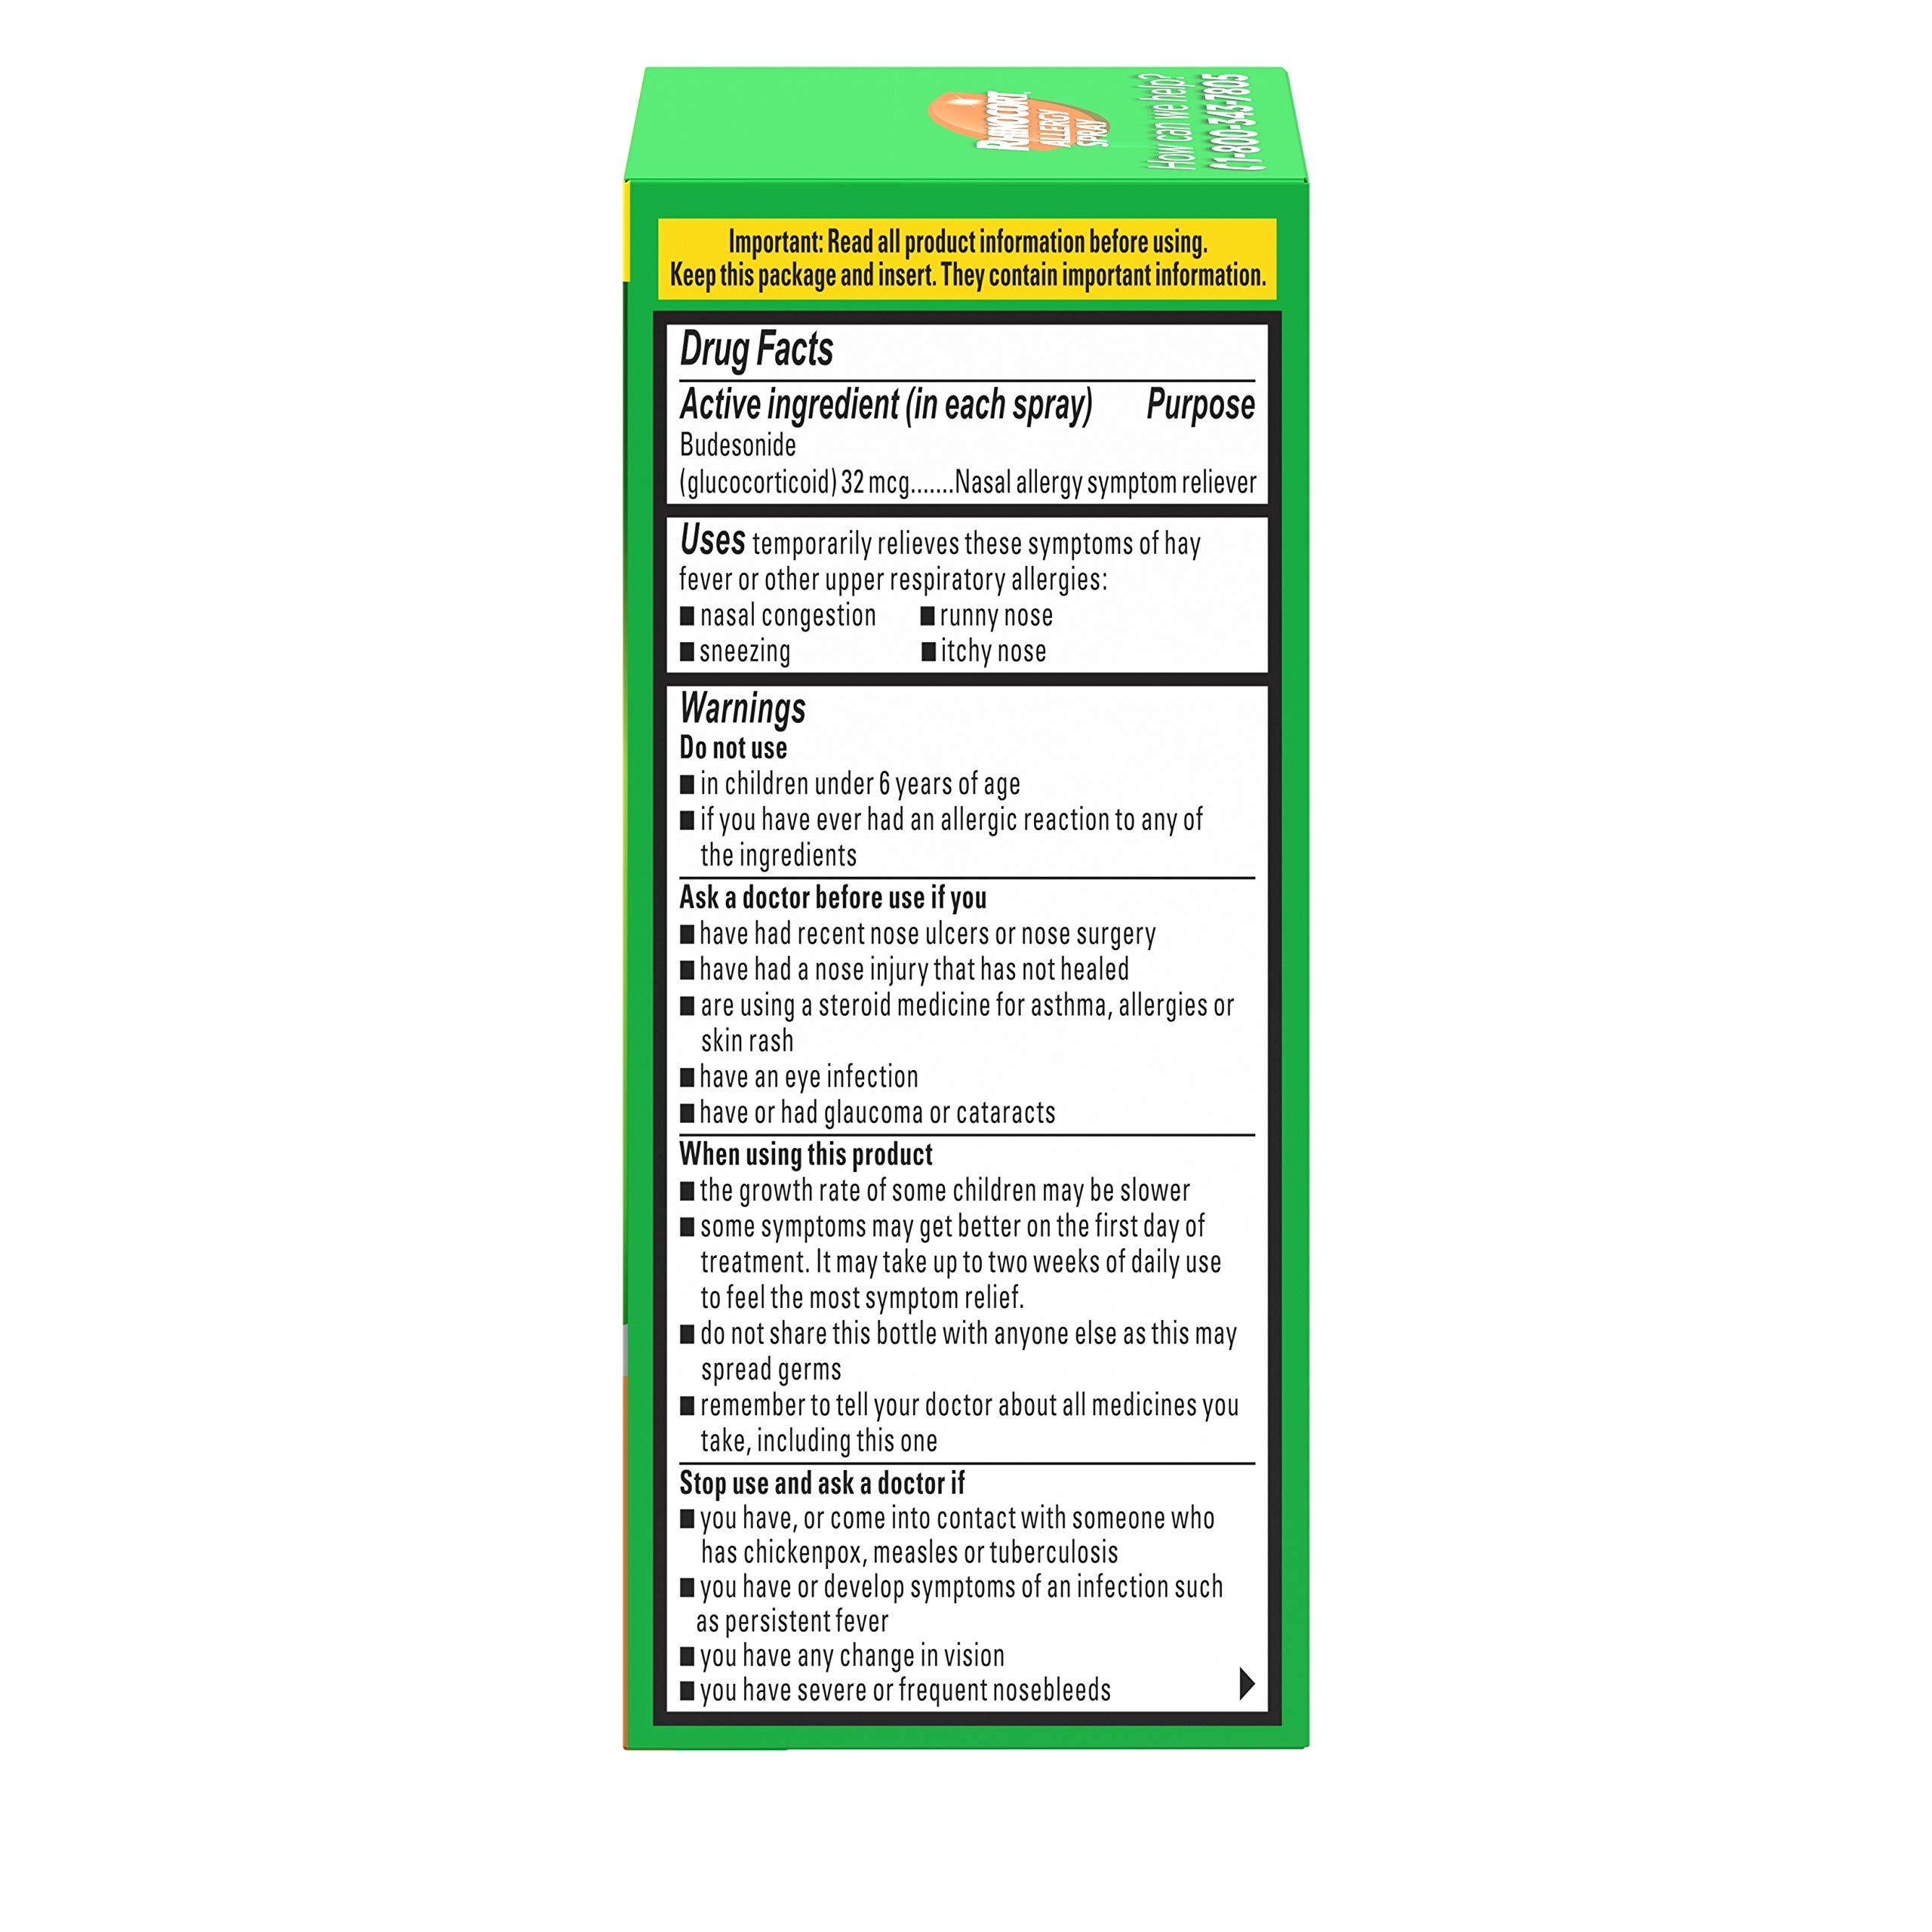 Rhinocort 24 Hour Non-Drowsy Allergy Relief Spray, 60 Sprays, 0.169 oz (Pack of 3) by rhinocort